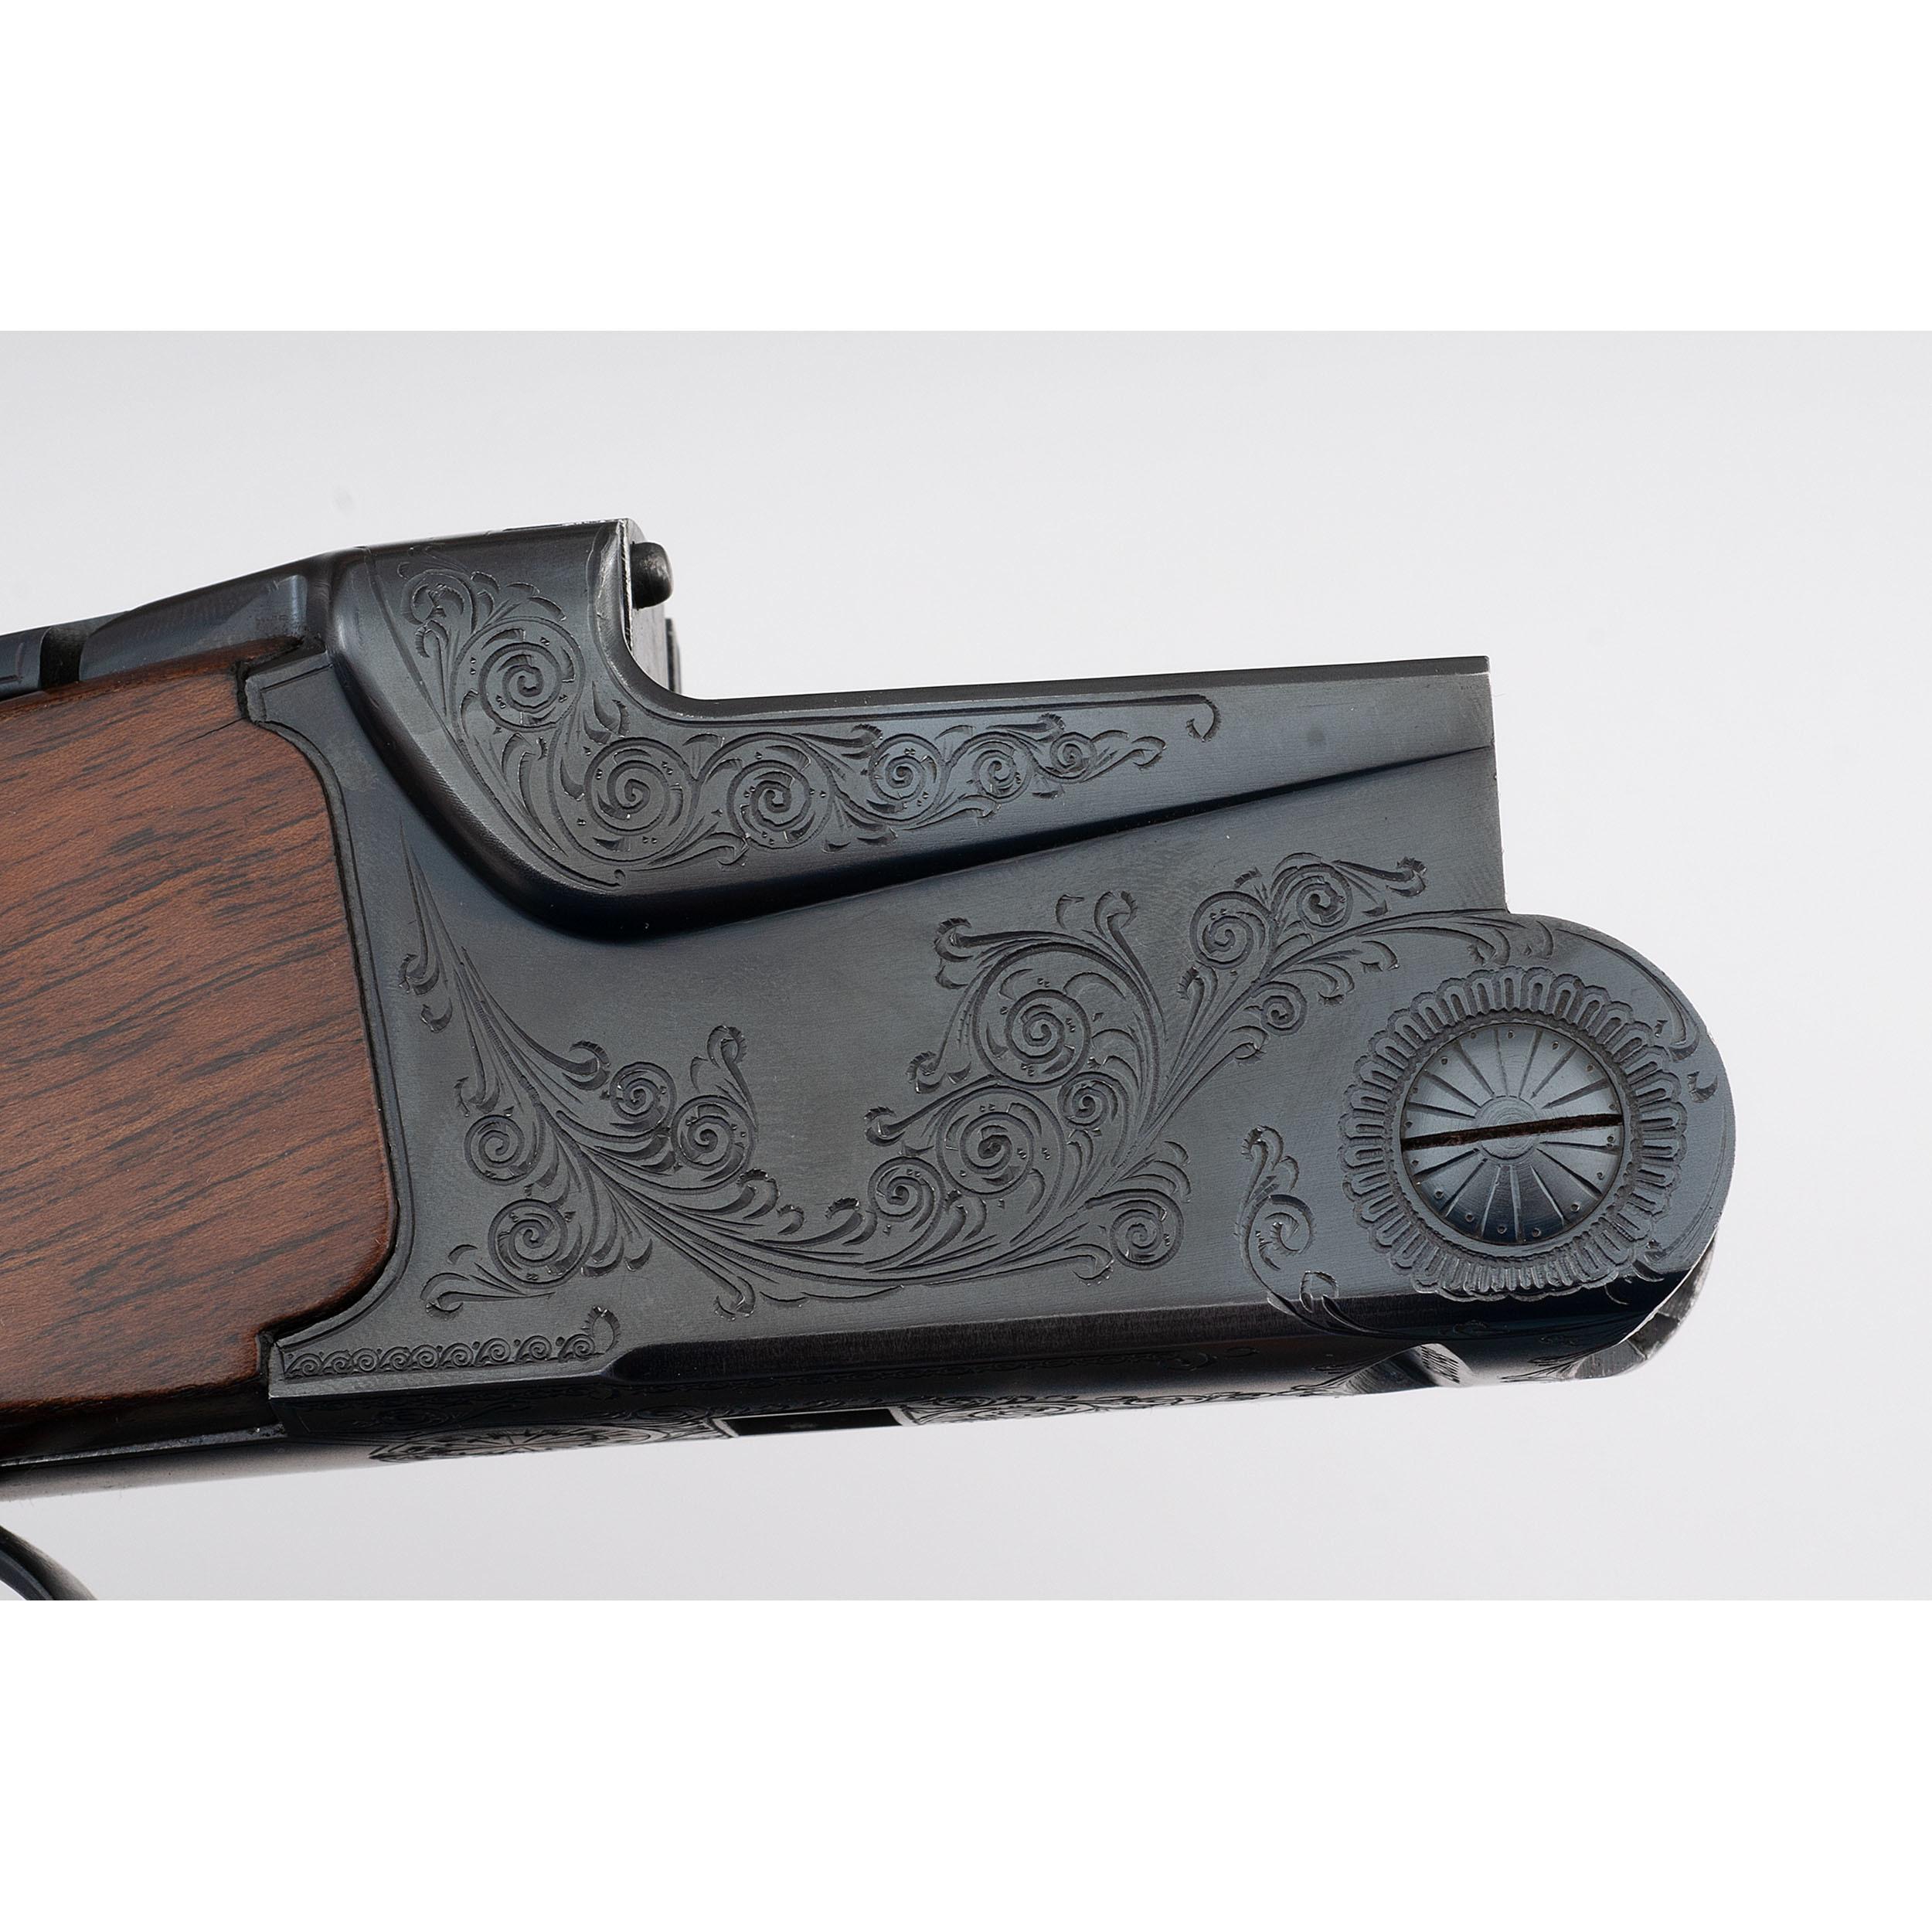 Ithaca Model 600 Three Barrel Set Shotgun | Cowan's Auction